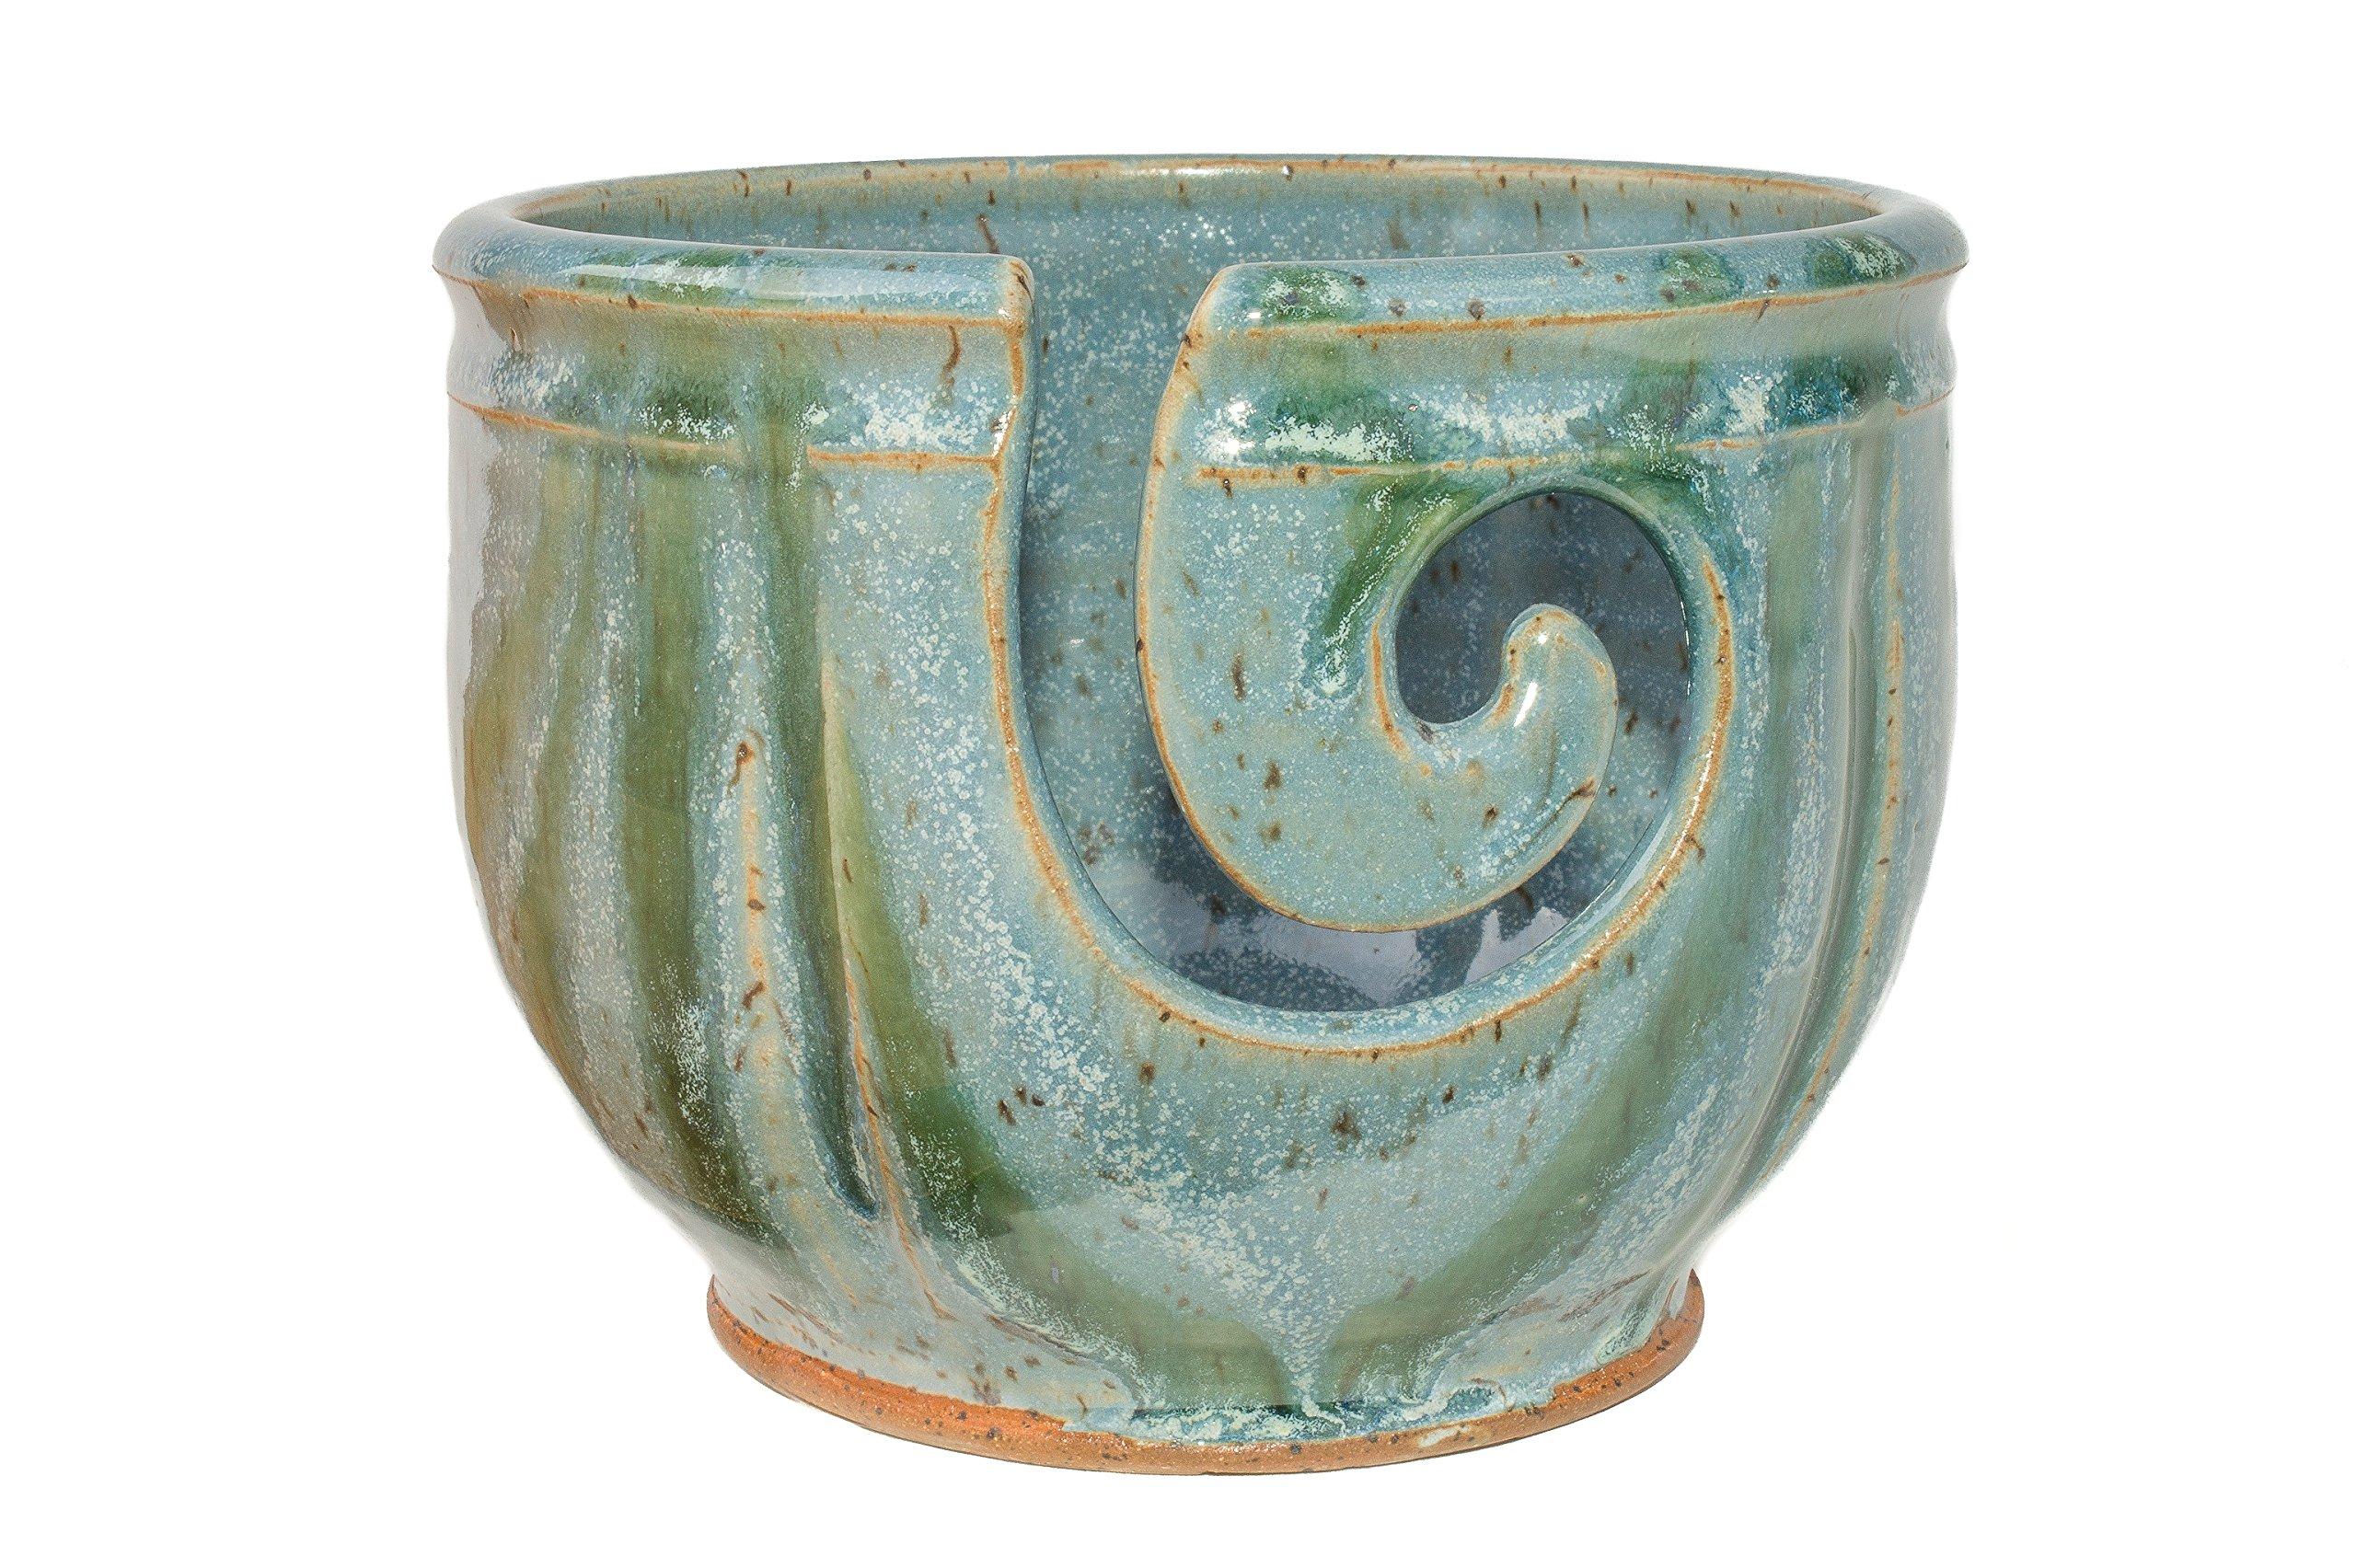 Midnight Sun Pottery Yarn Bowl - Glacier with Green